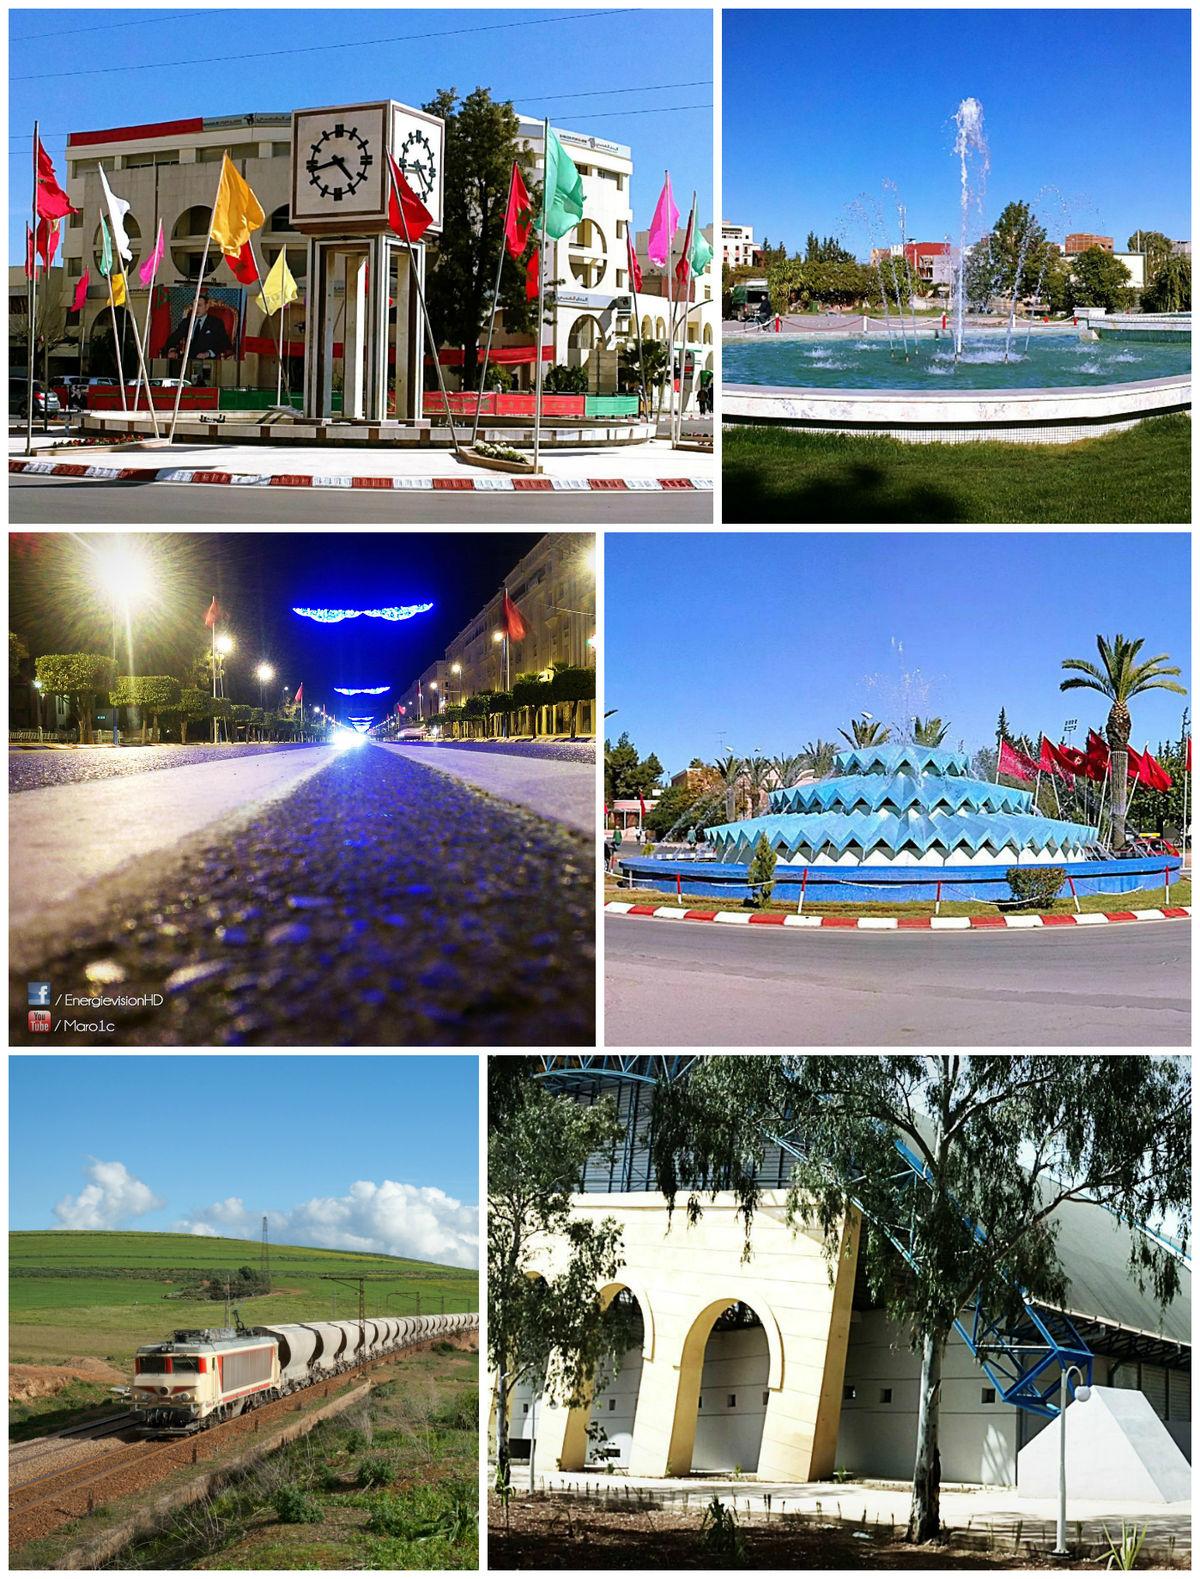 Khouribga - Wikipedia